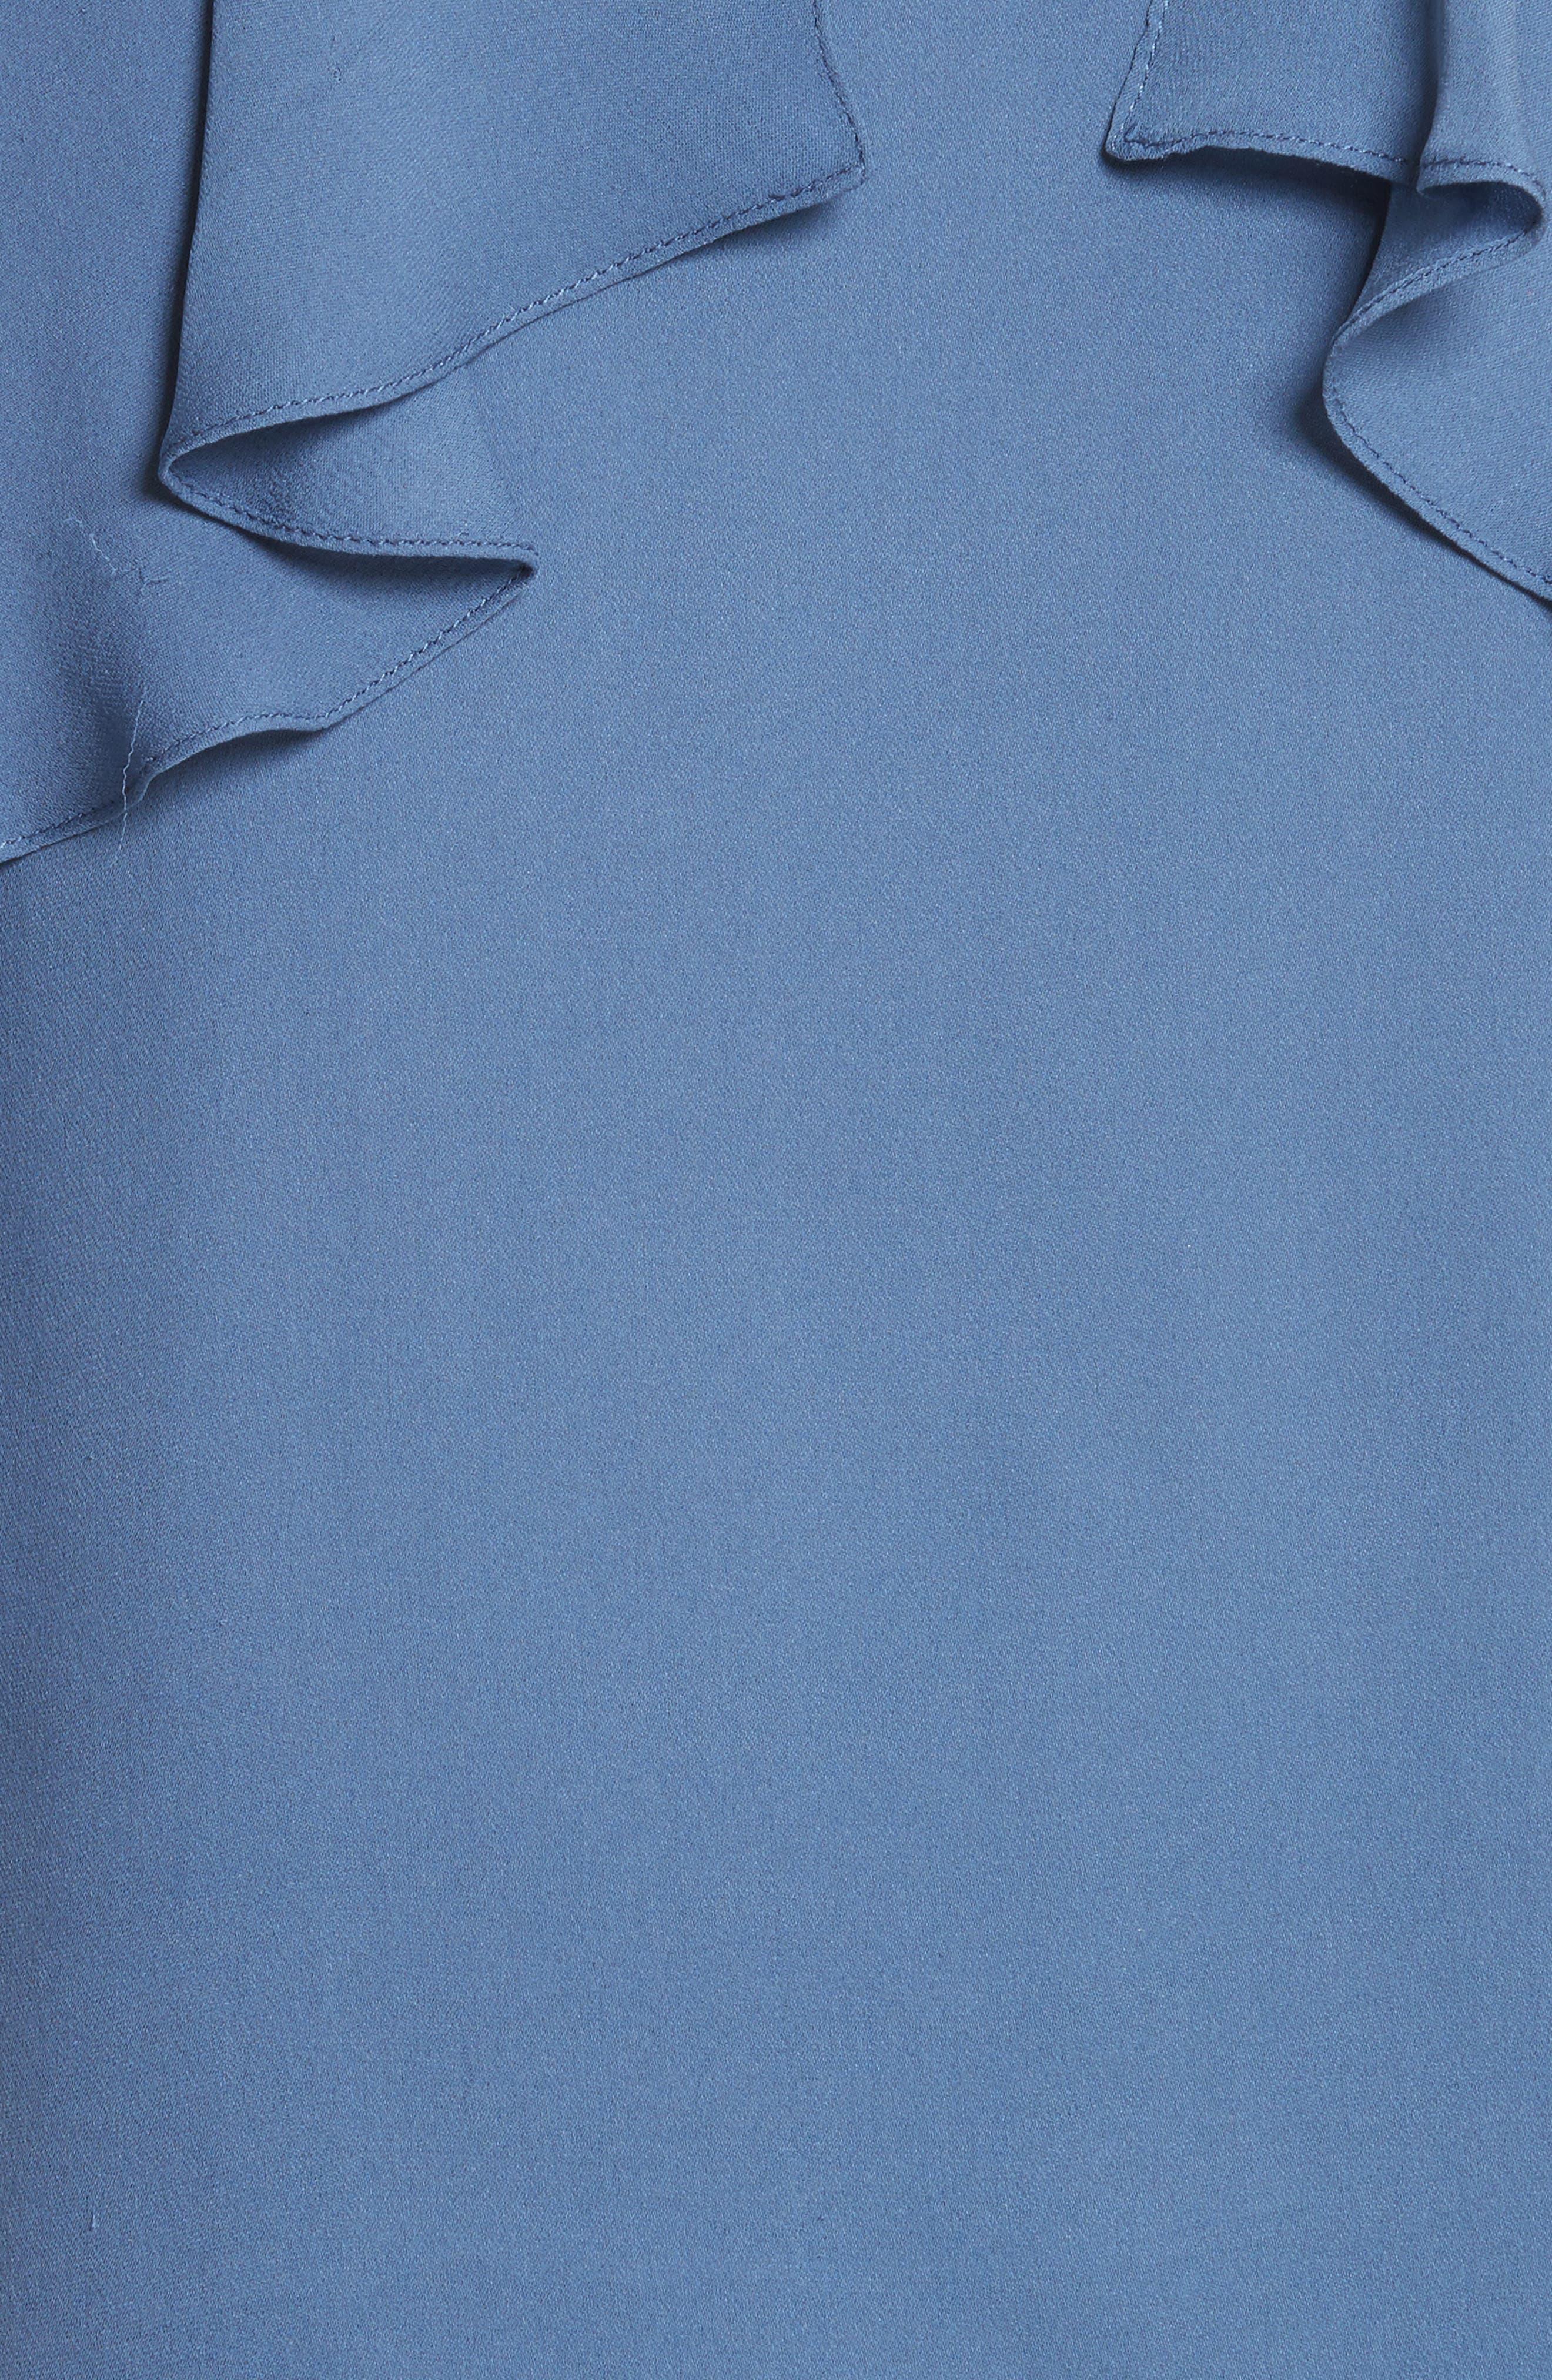 Idalla Cold Shoulder Ruffle Silk Blouse,                             Alternate thumbnail 5, color,                             401